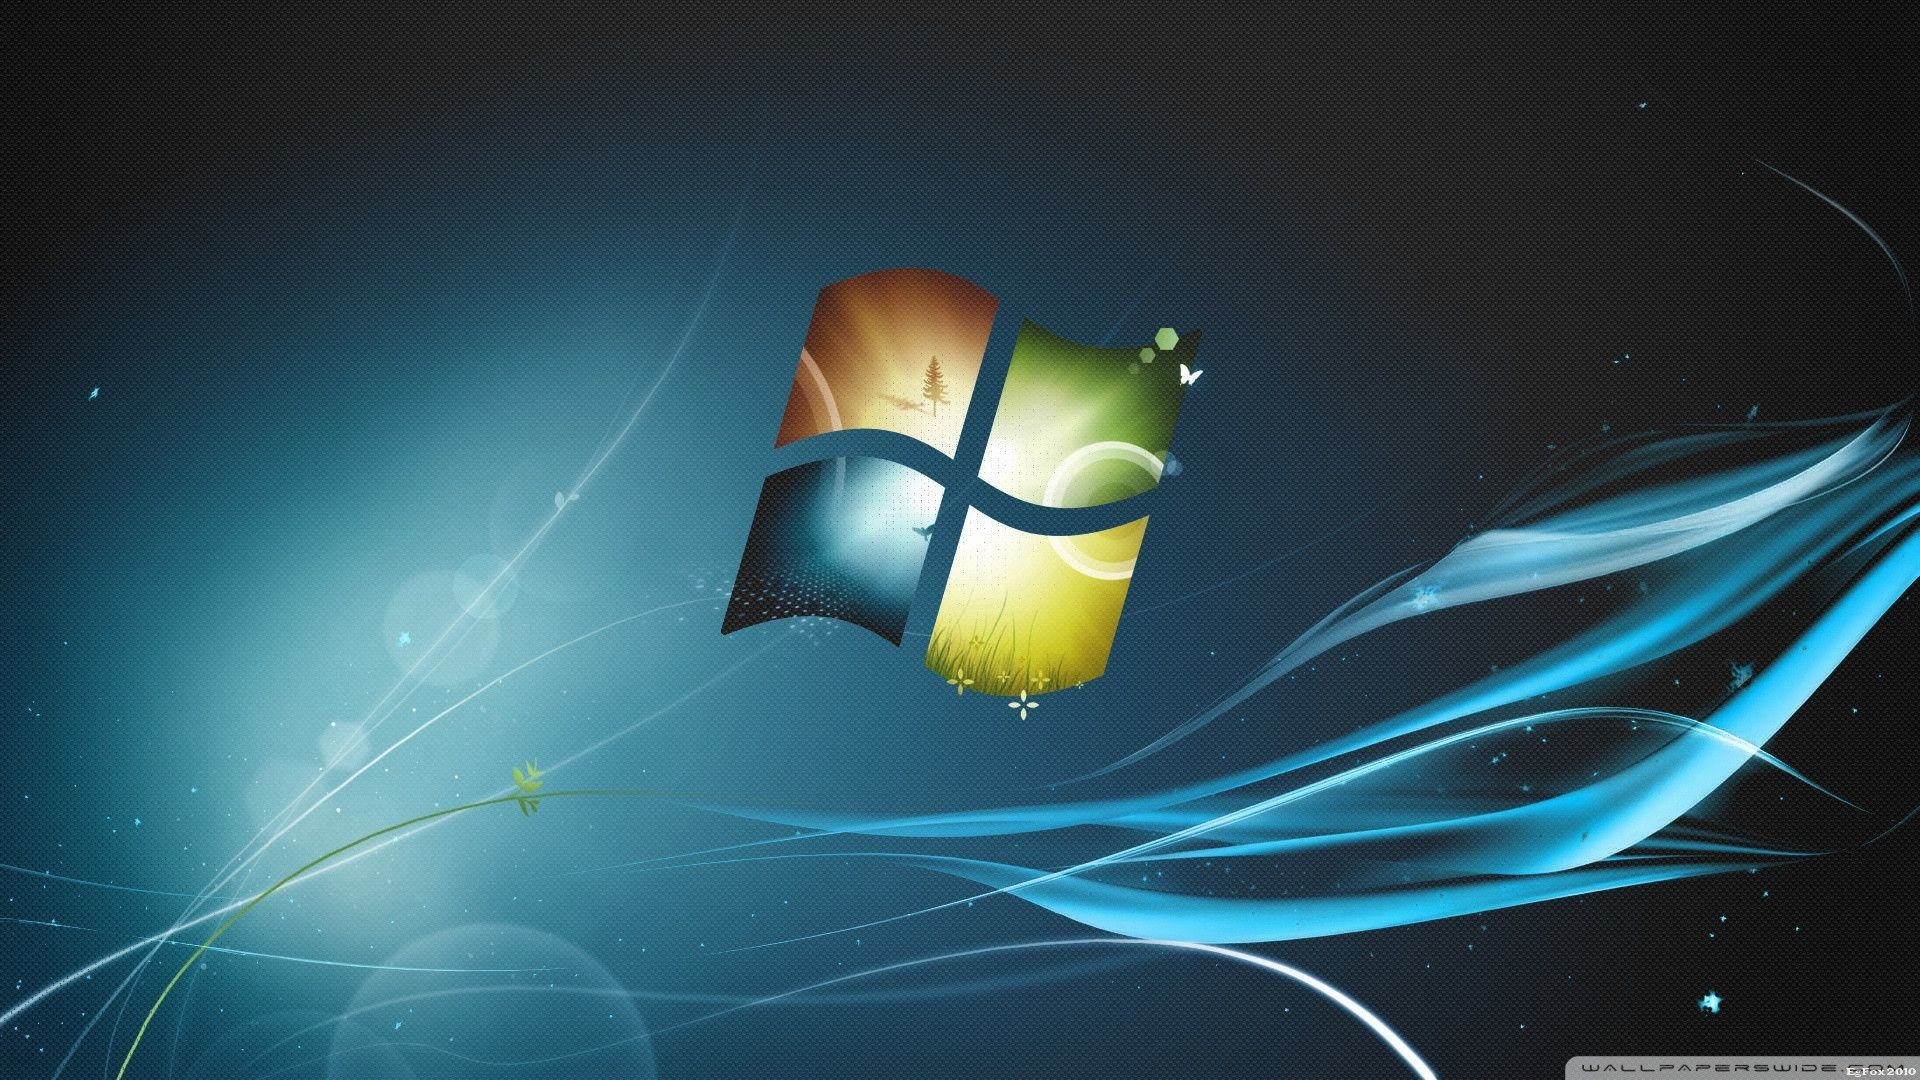 Windows Purple HD desktop wallpaper : Widescreen : High 1920×1080 Windows 7 HD  Wallpapers